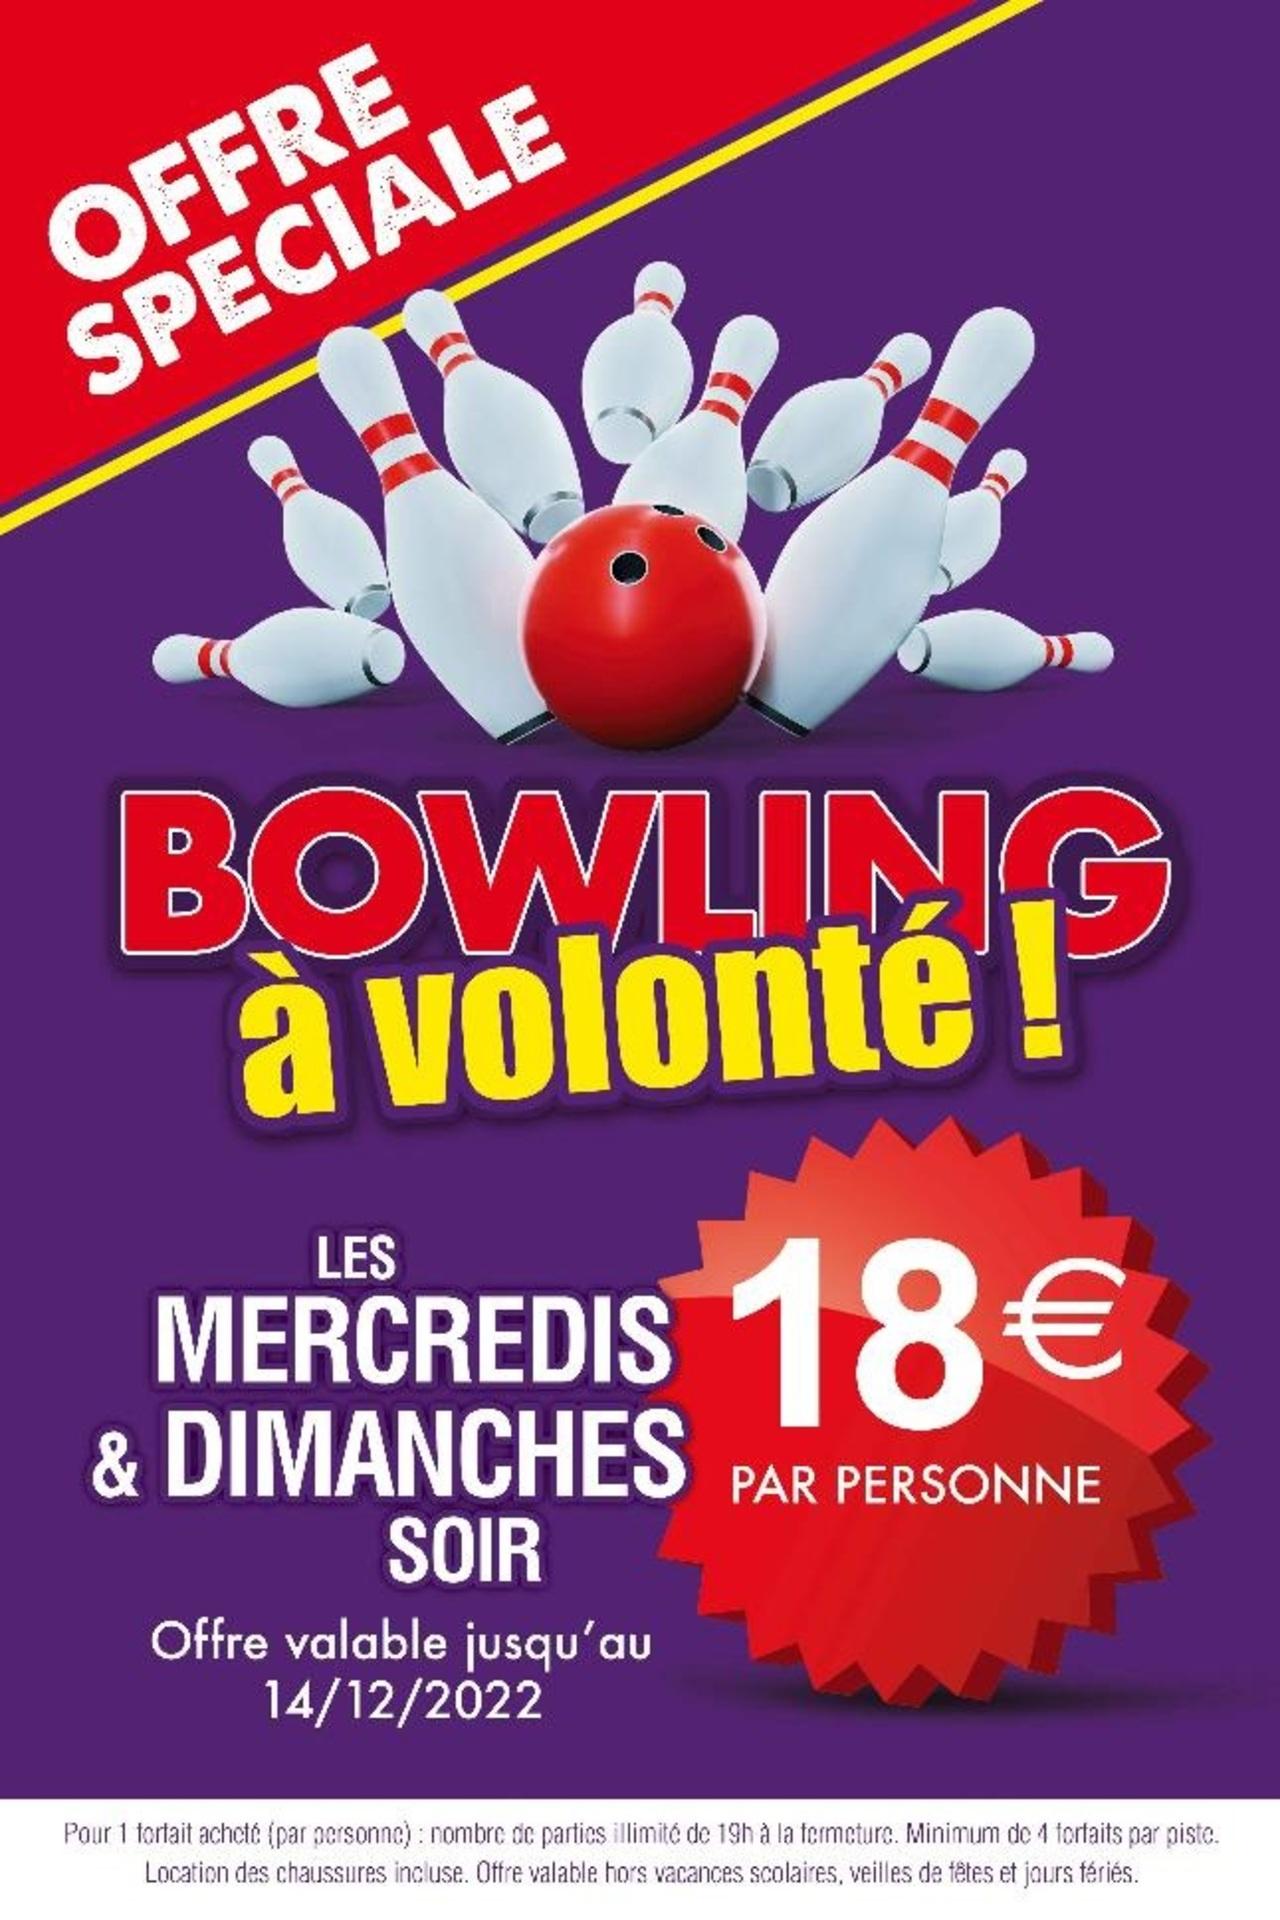 BOWLING A VOLONTE LE Mercredi soir